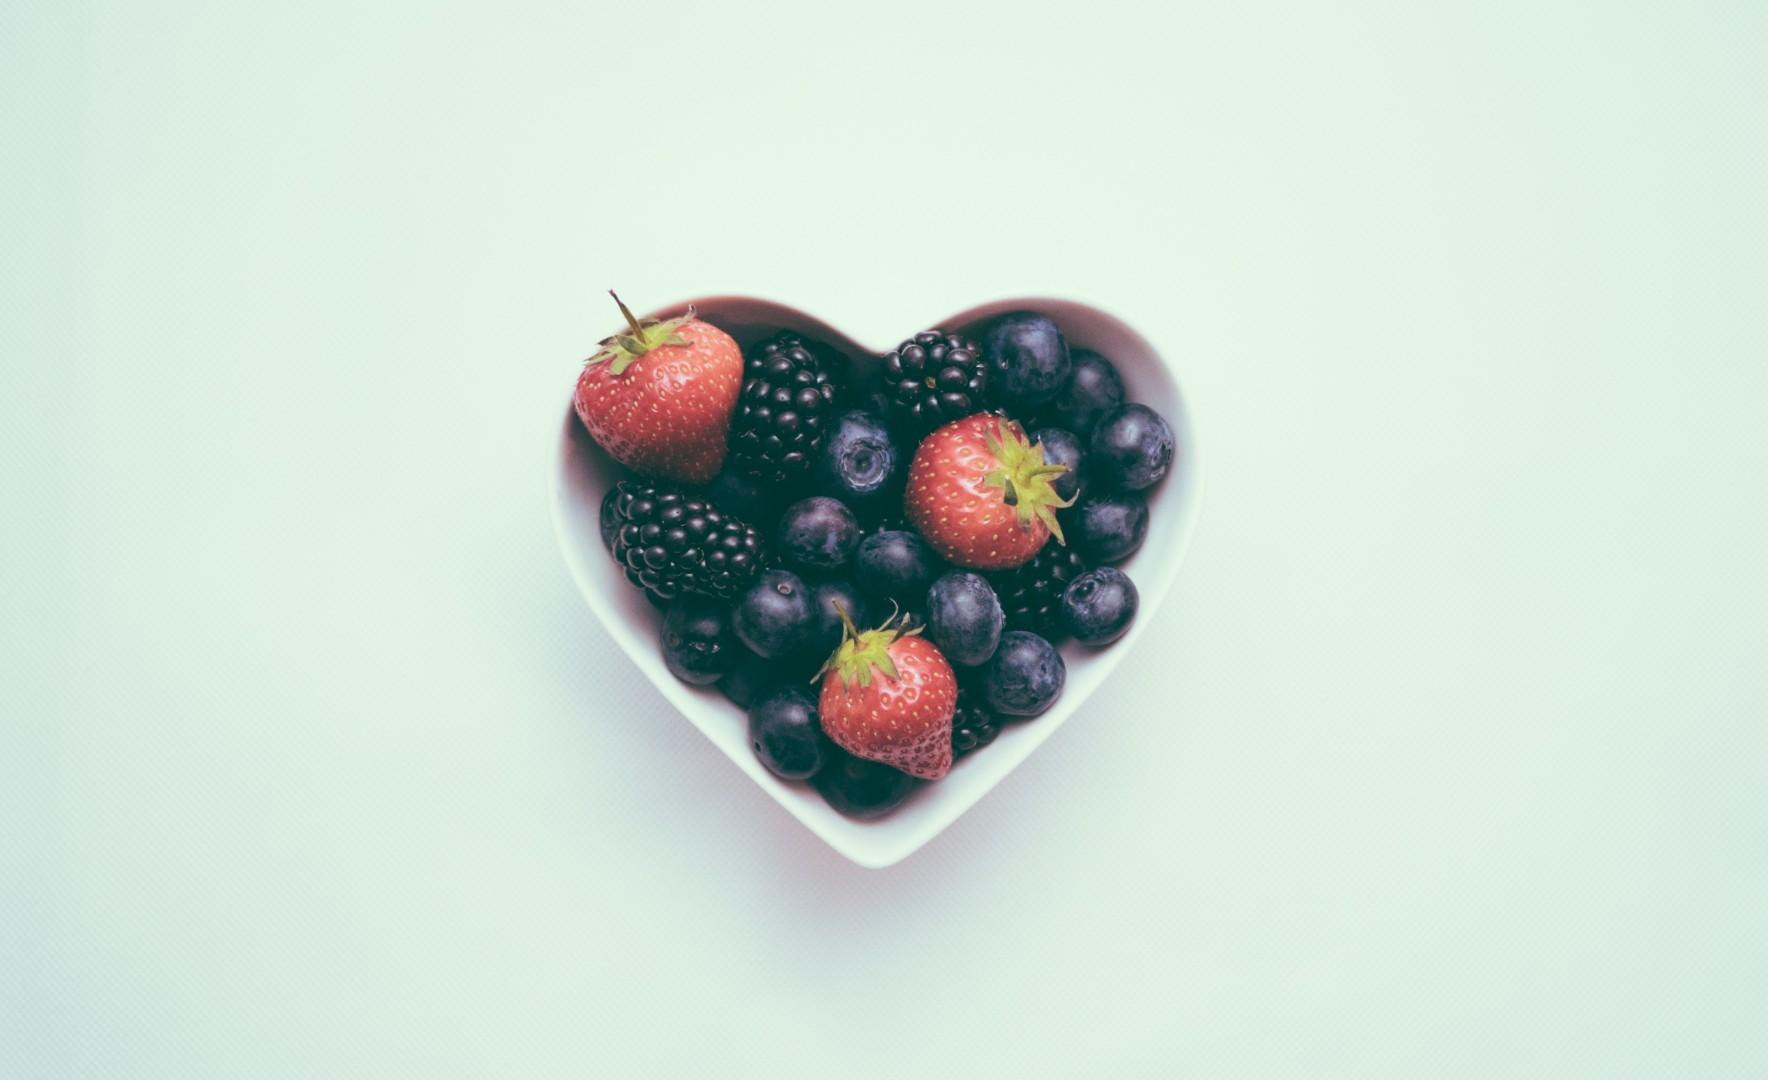 L'app Wellness Habits desenvolupada per BaseTIS